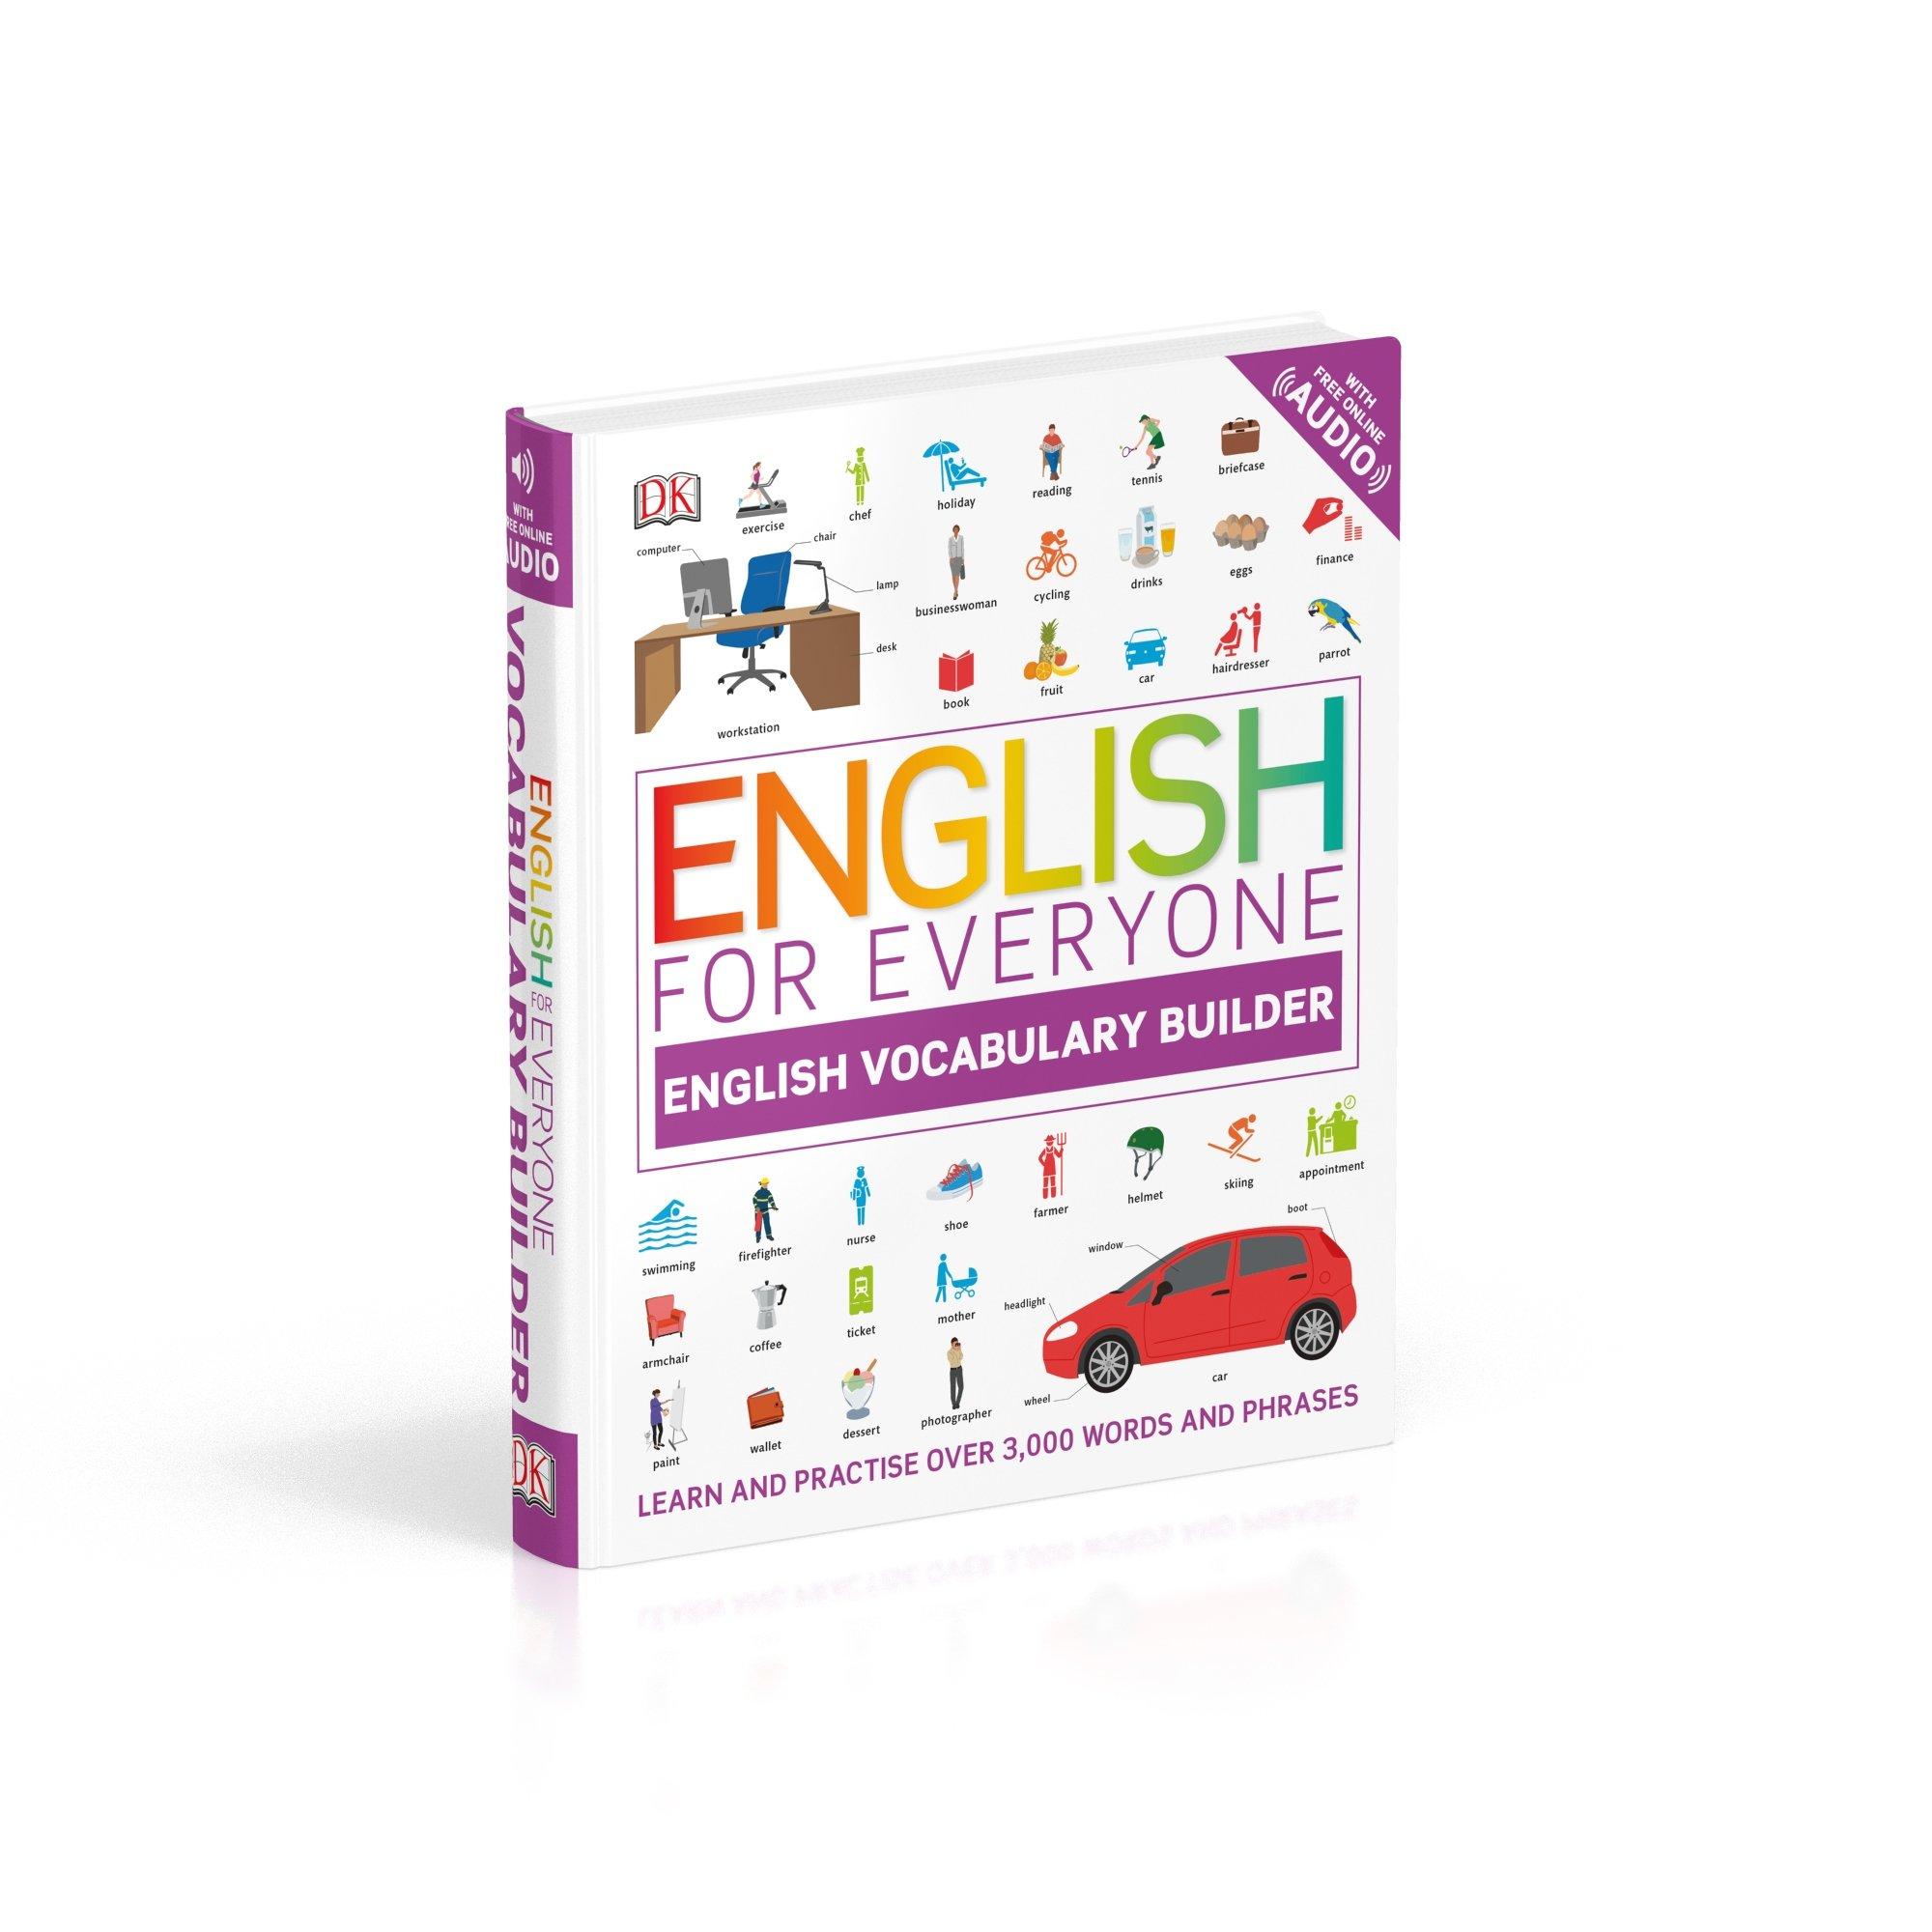 English for Everyone English Vocabulary Builder: Amazon co